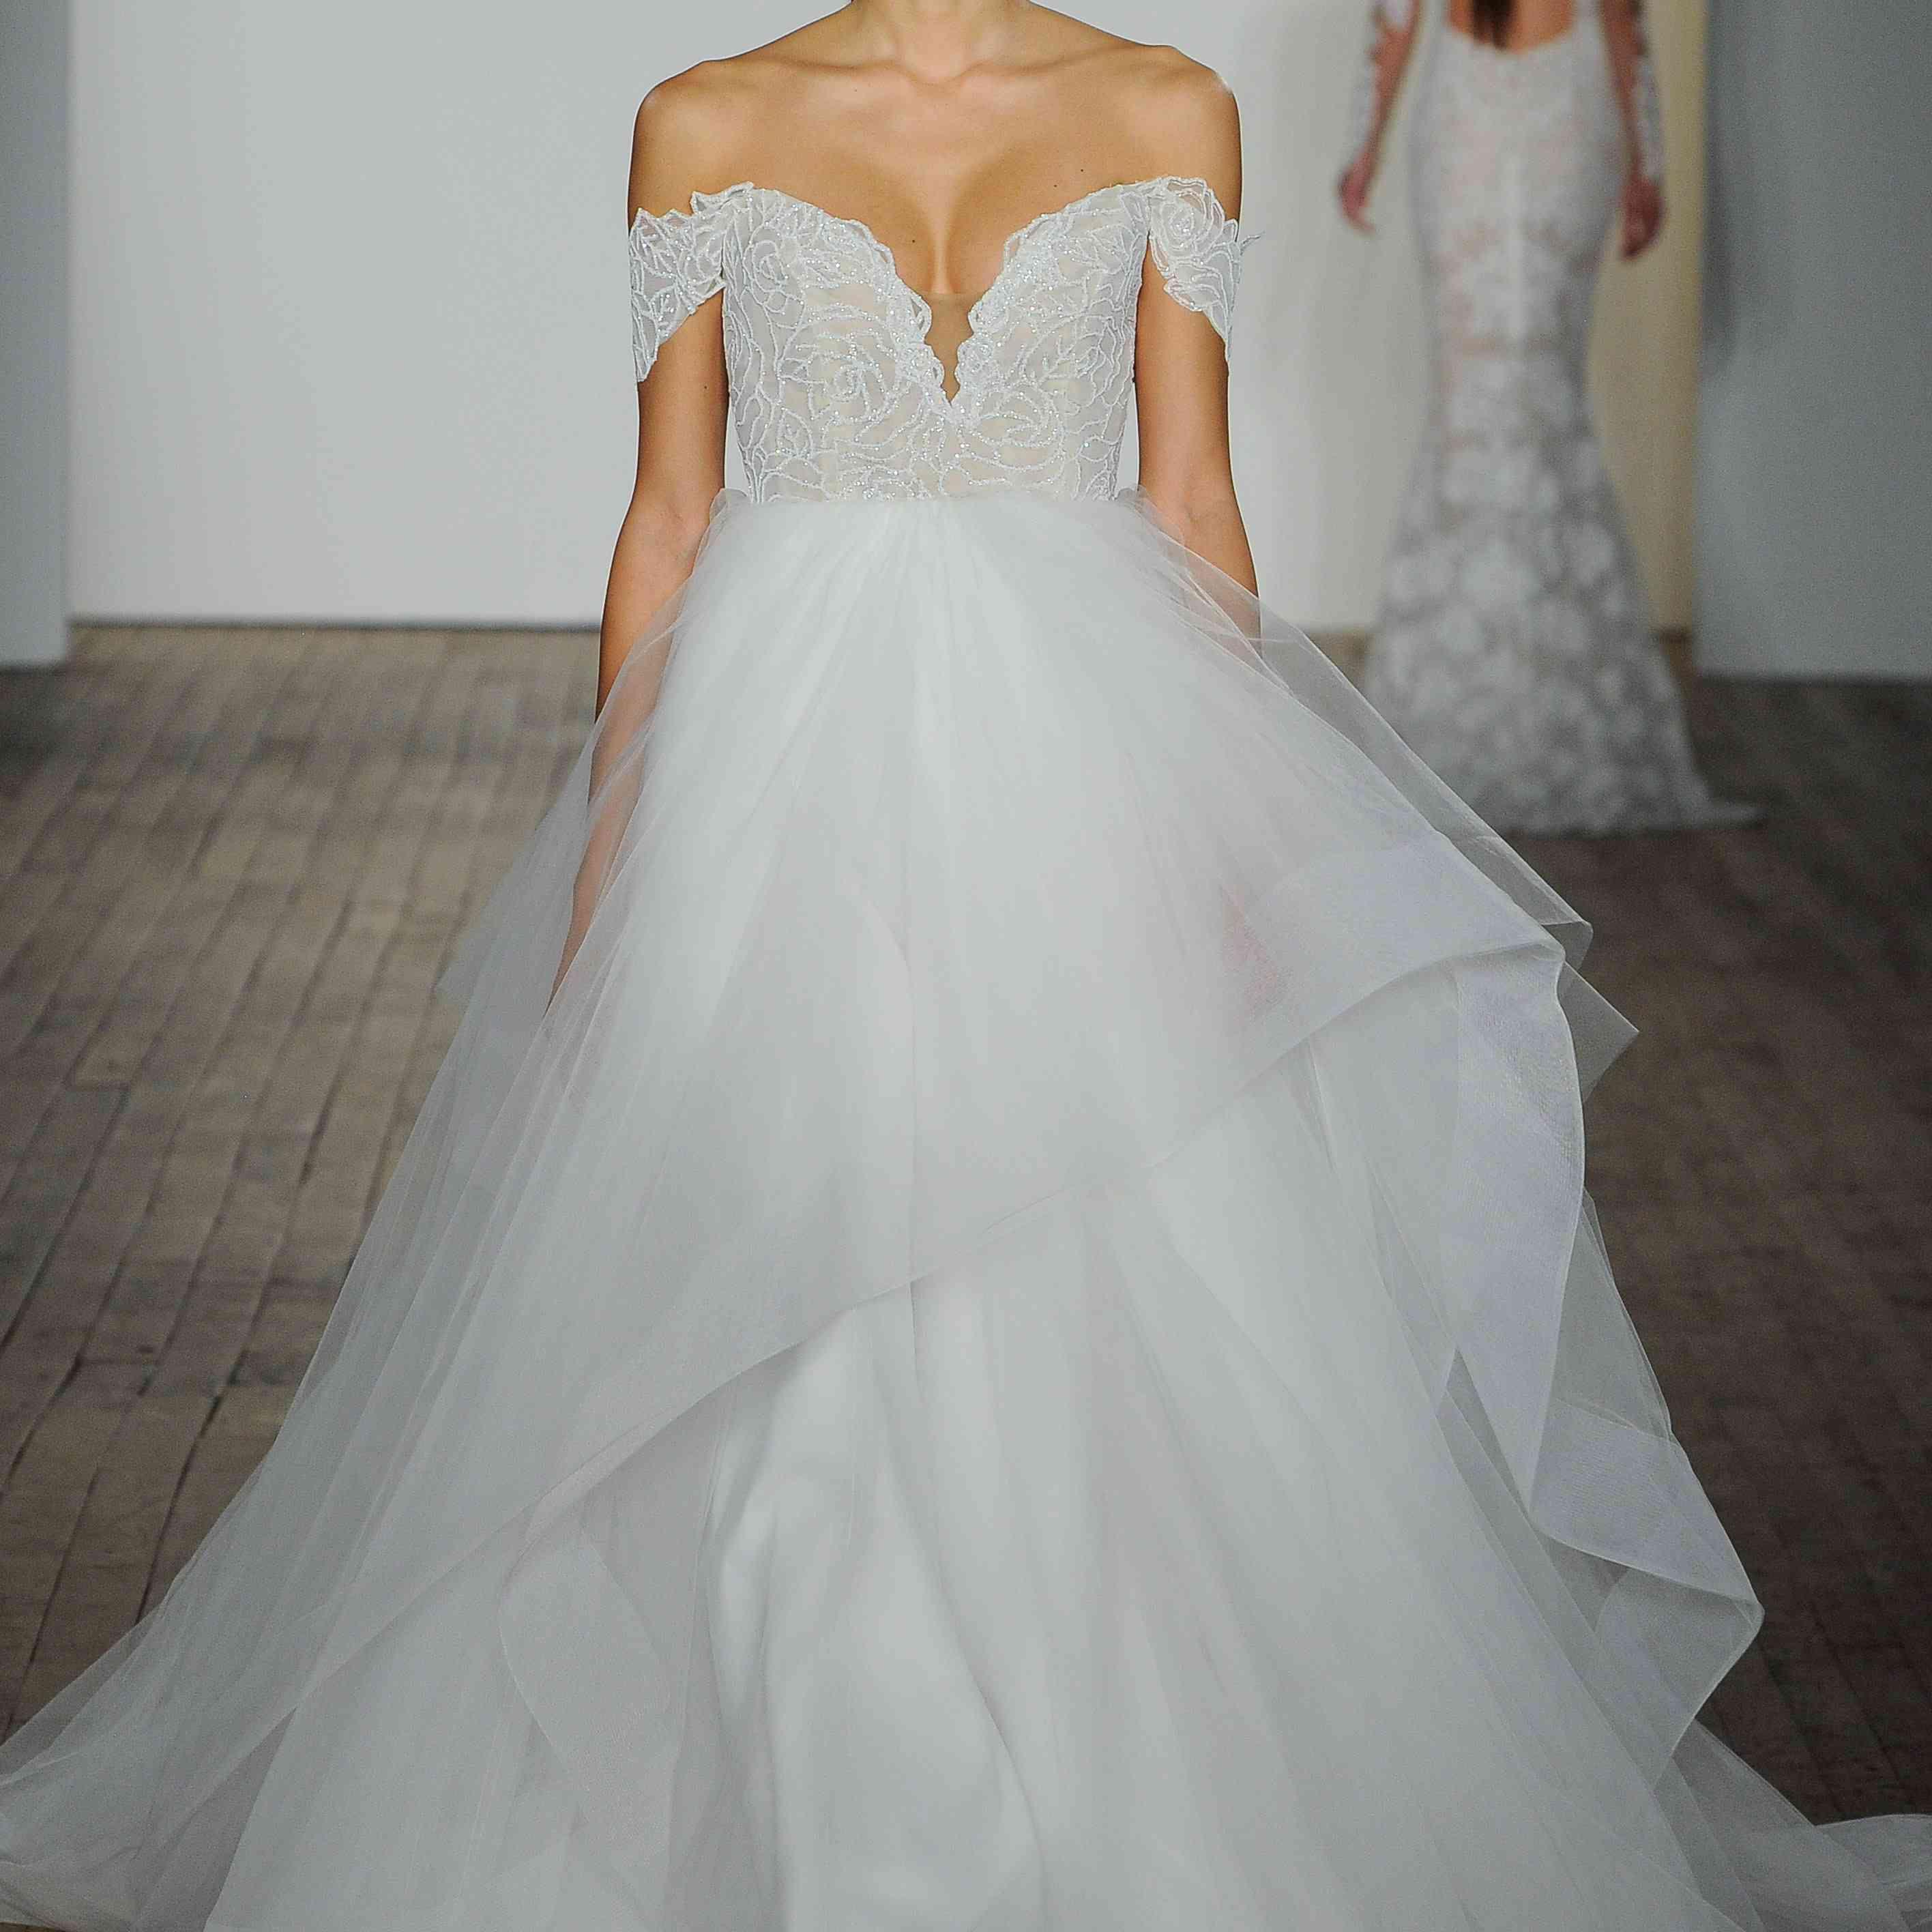 Charm off-the-shoulder wedding dress